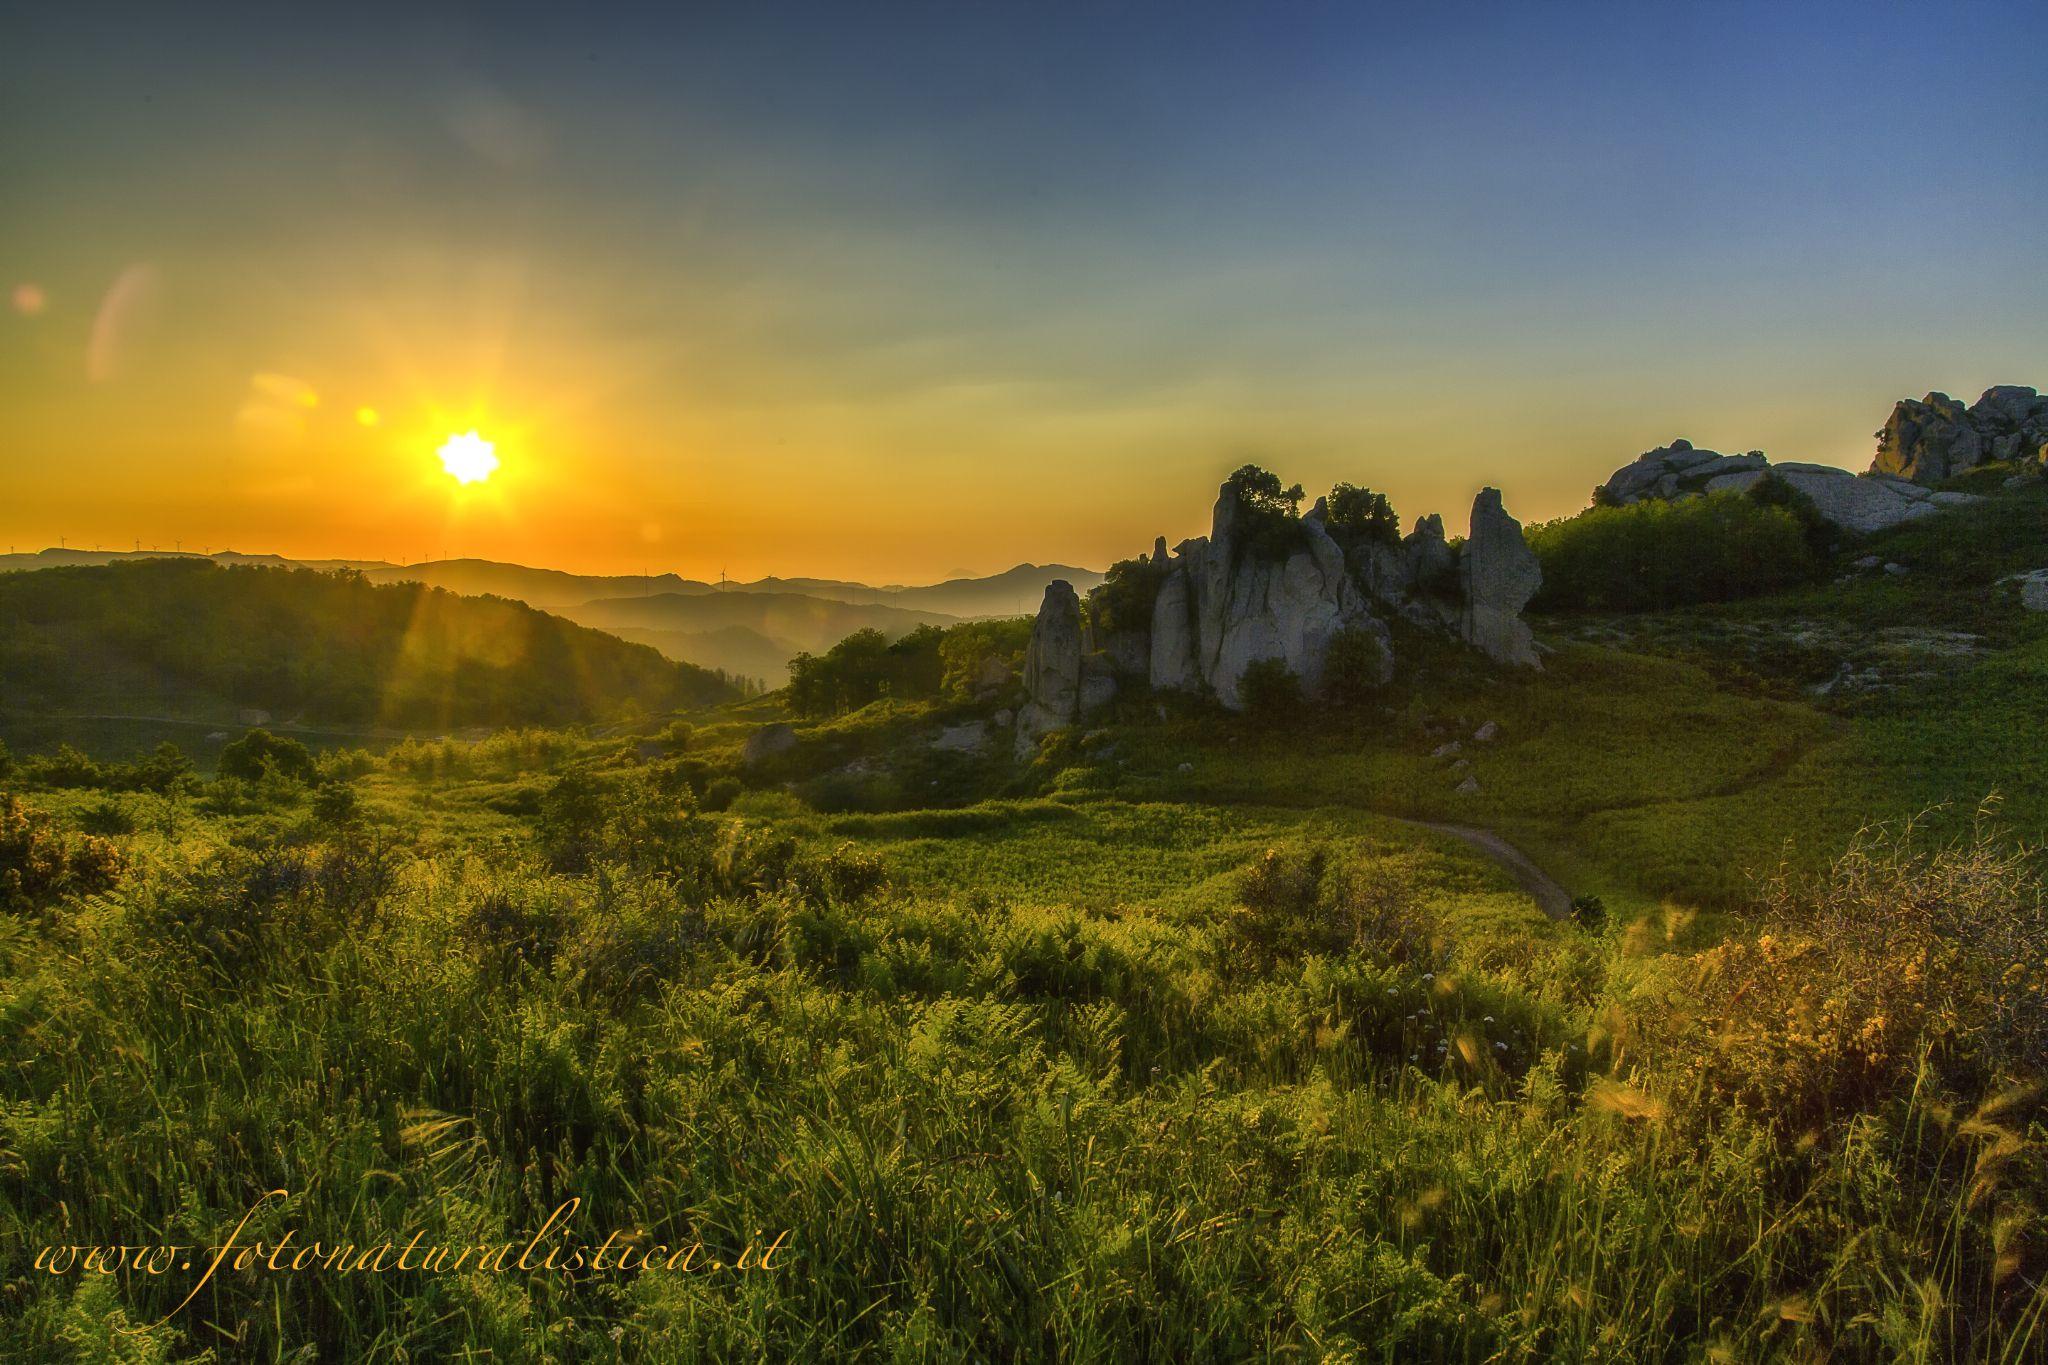 Sunset on the monoliths by Fotonaturalistica Giuseppe Parisi